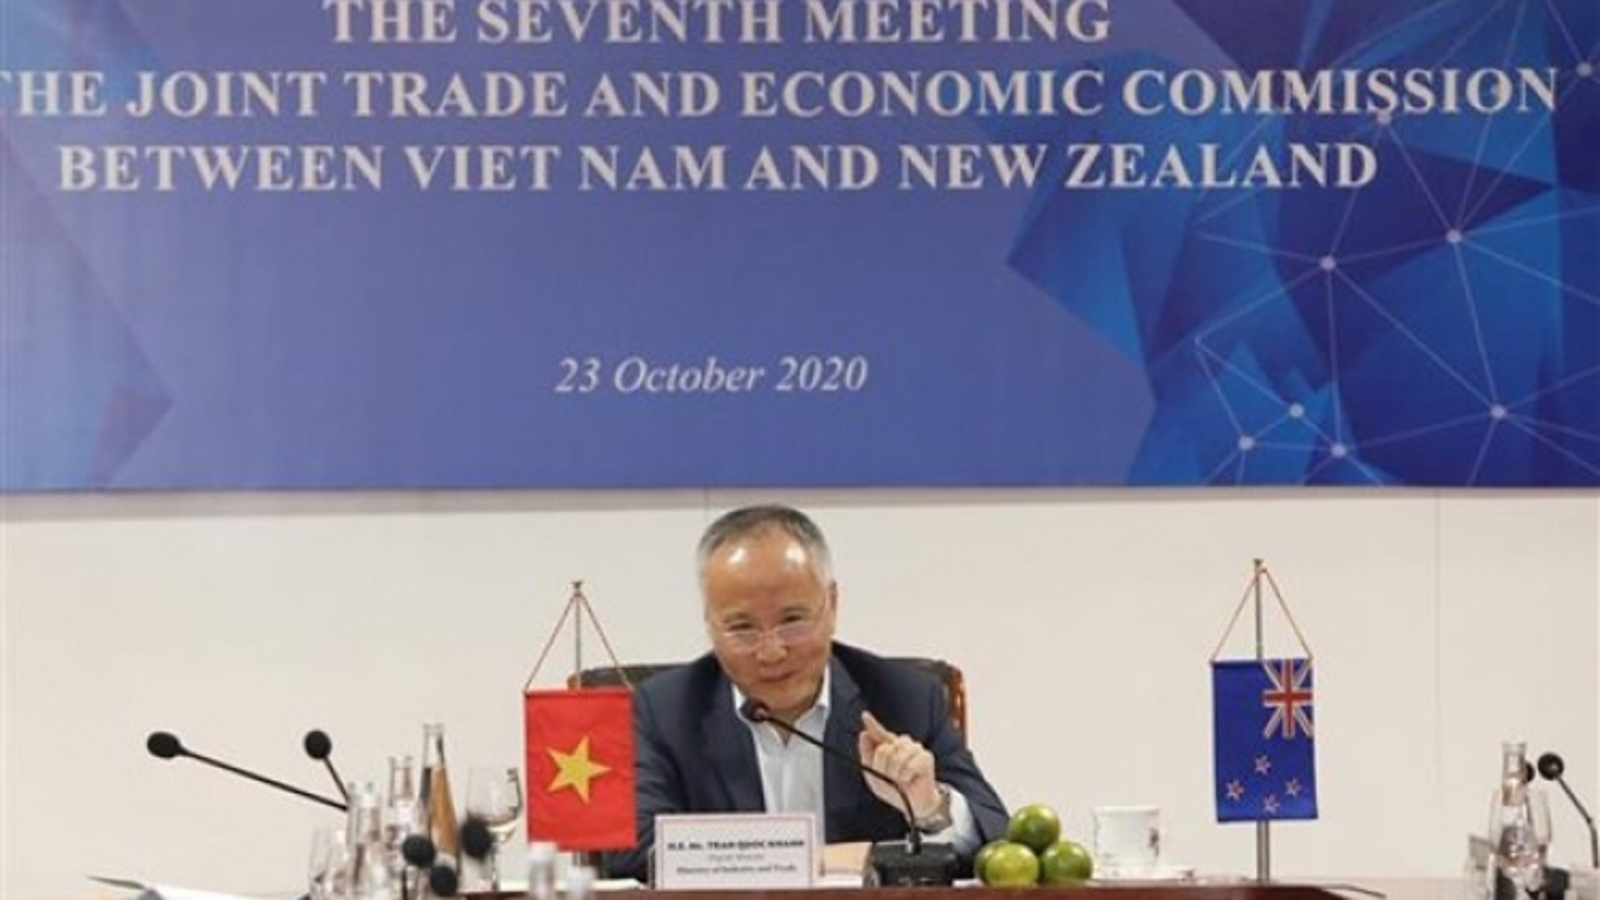 Vietnam, New Zealand examine ways to foster trade and economic links